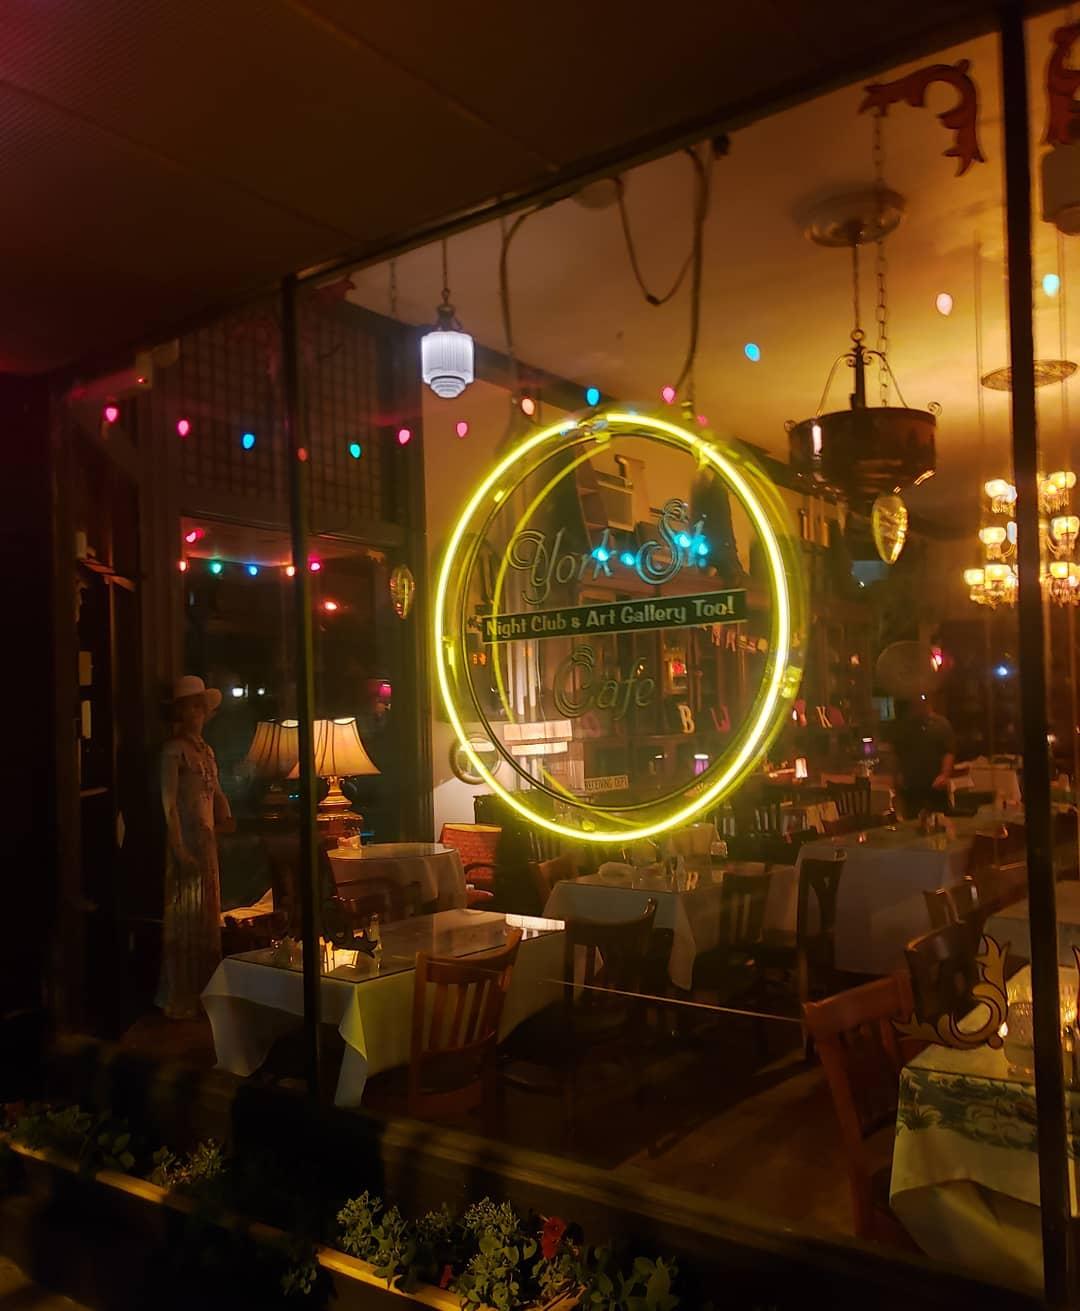 York St. Cafe 738 York St, Newport